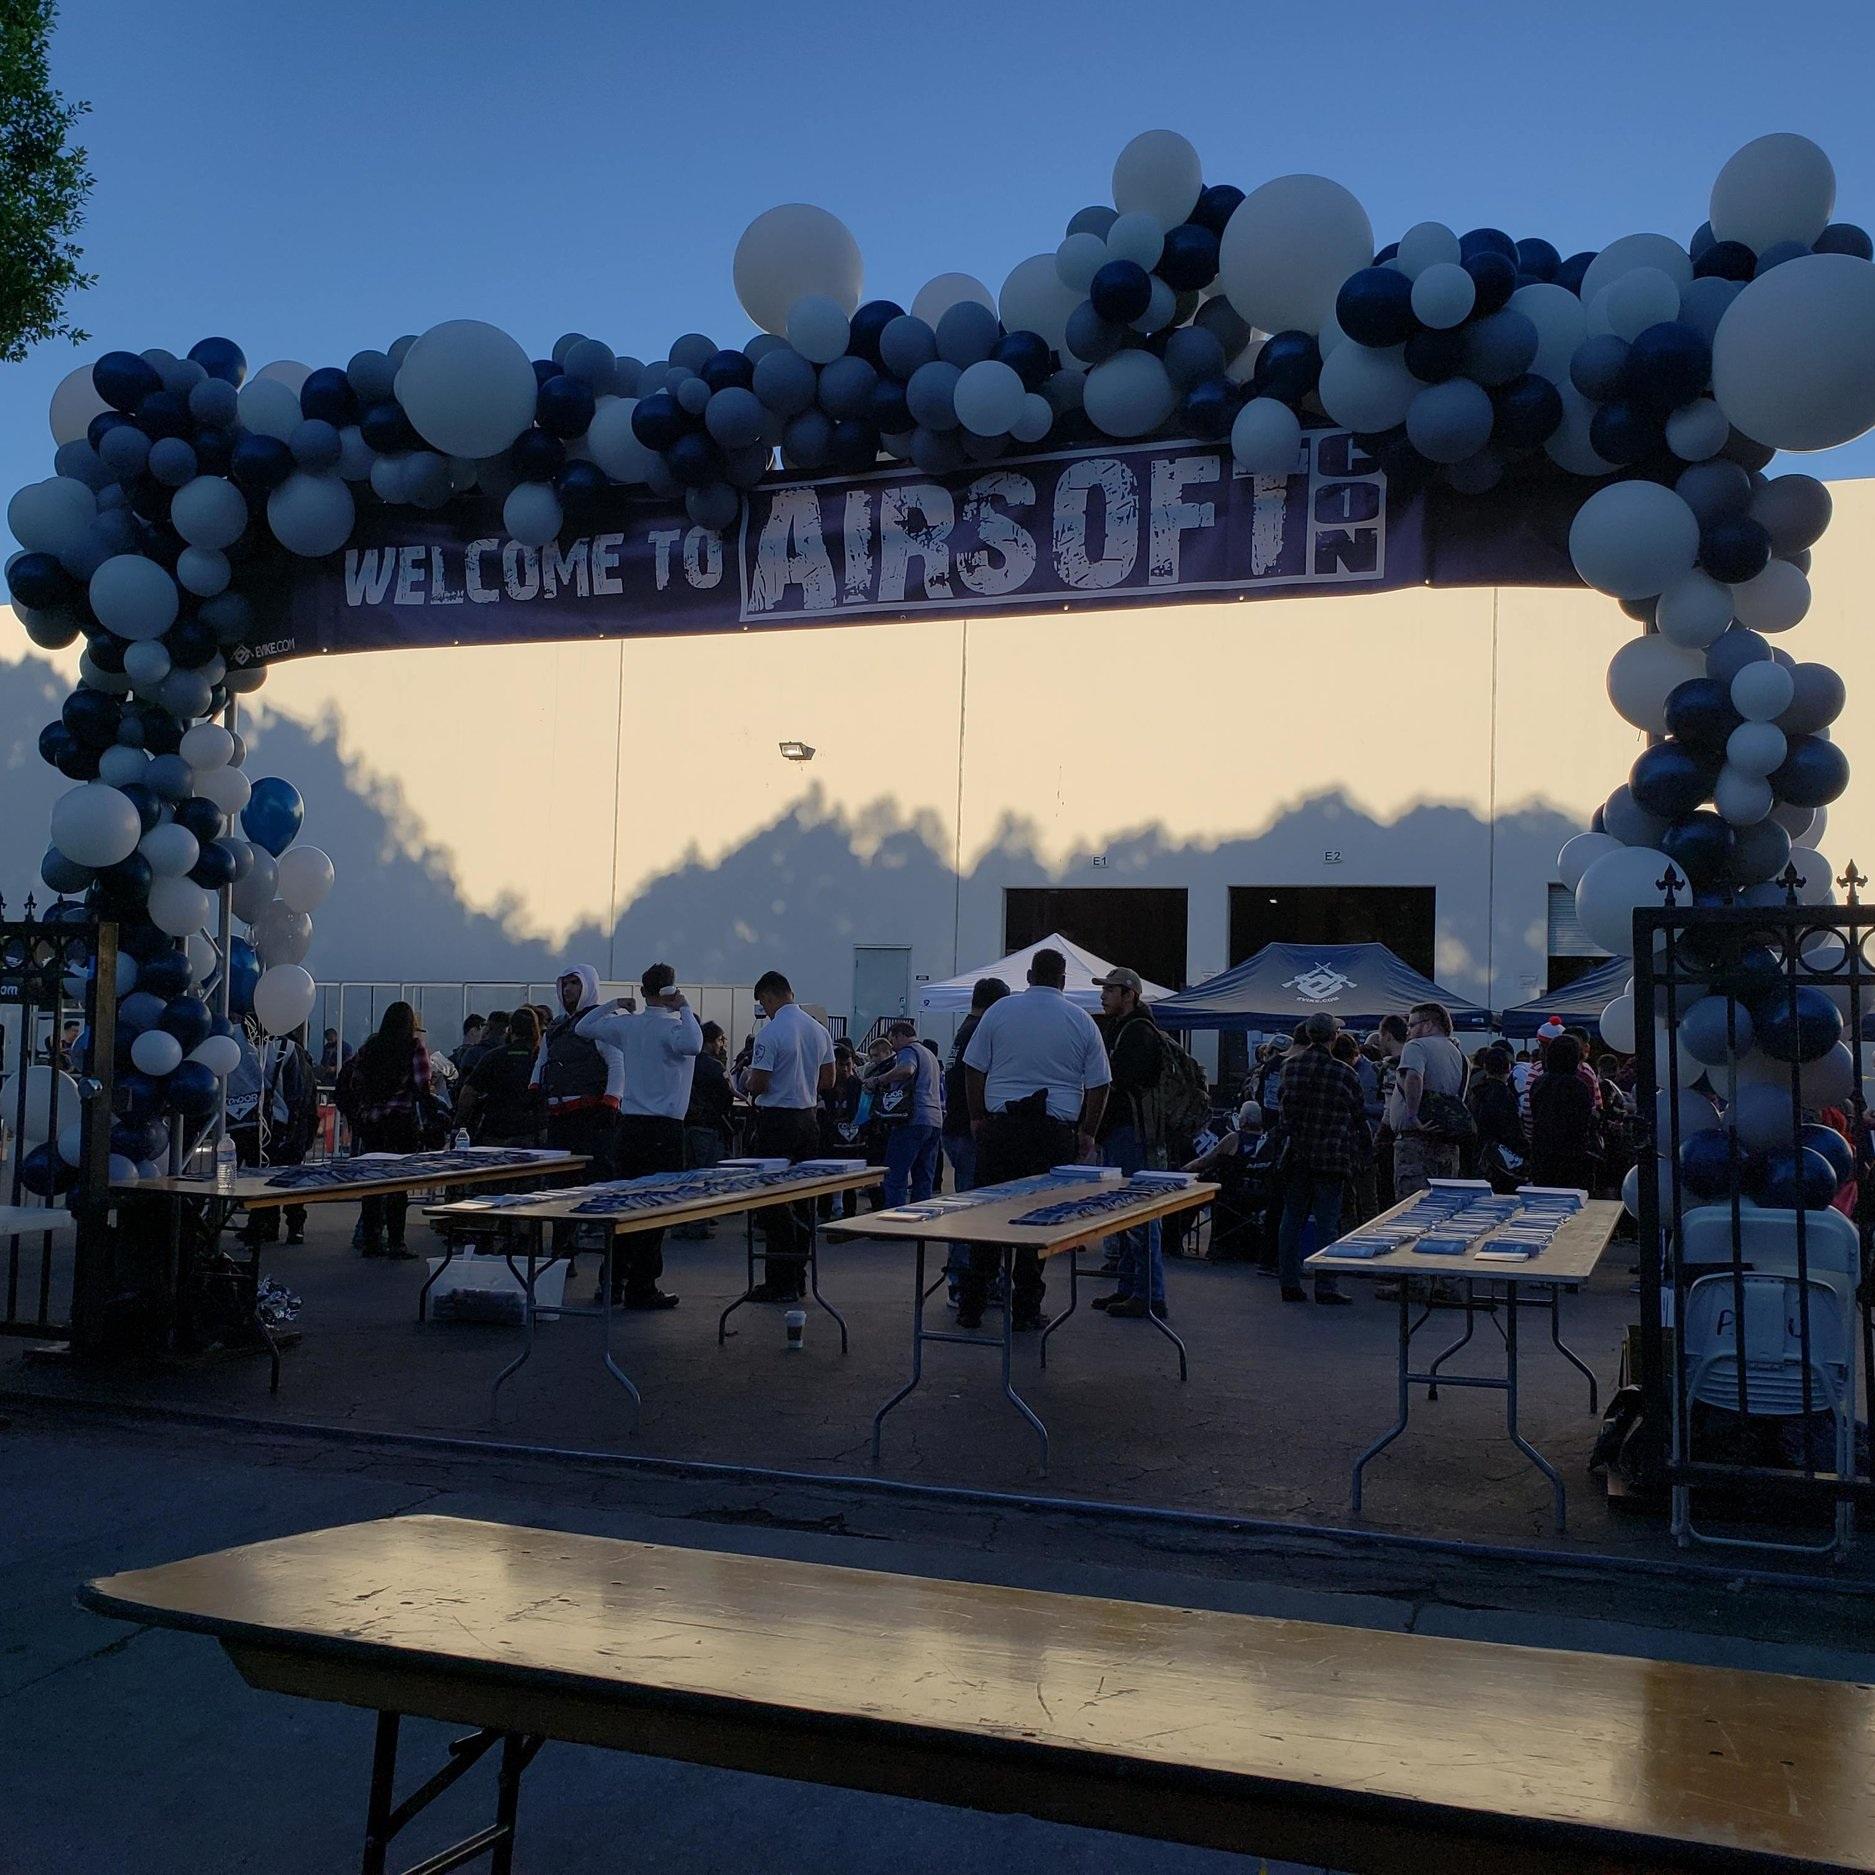 EVIKE AIRSOFT Con 2018*, EVIKE - EVIKE Super Store | Alhambra, CAOctober 20, 2018